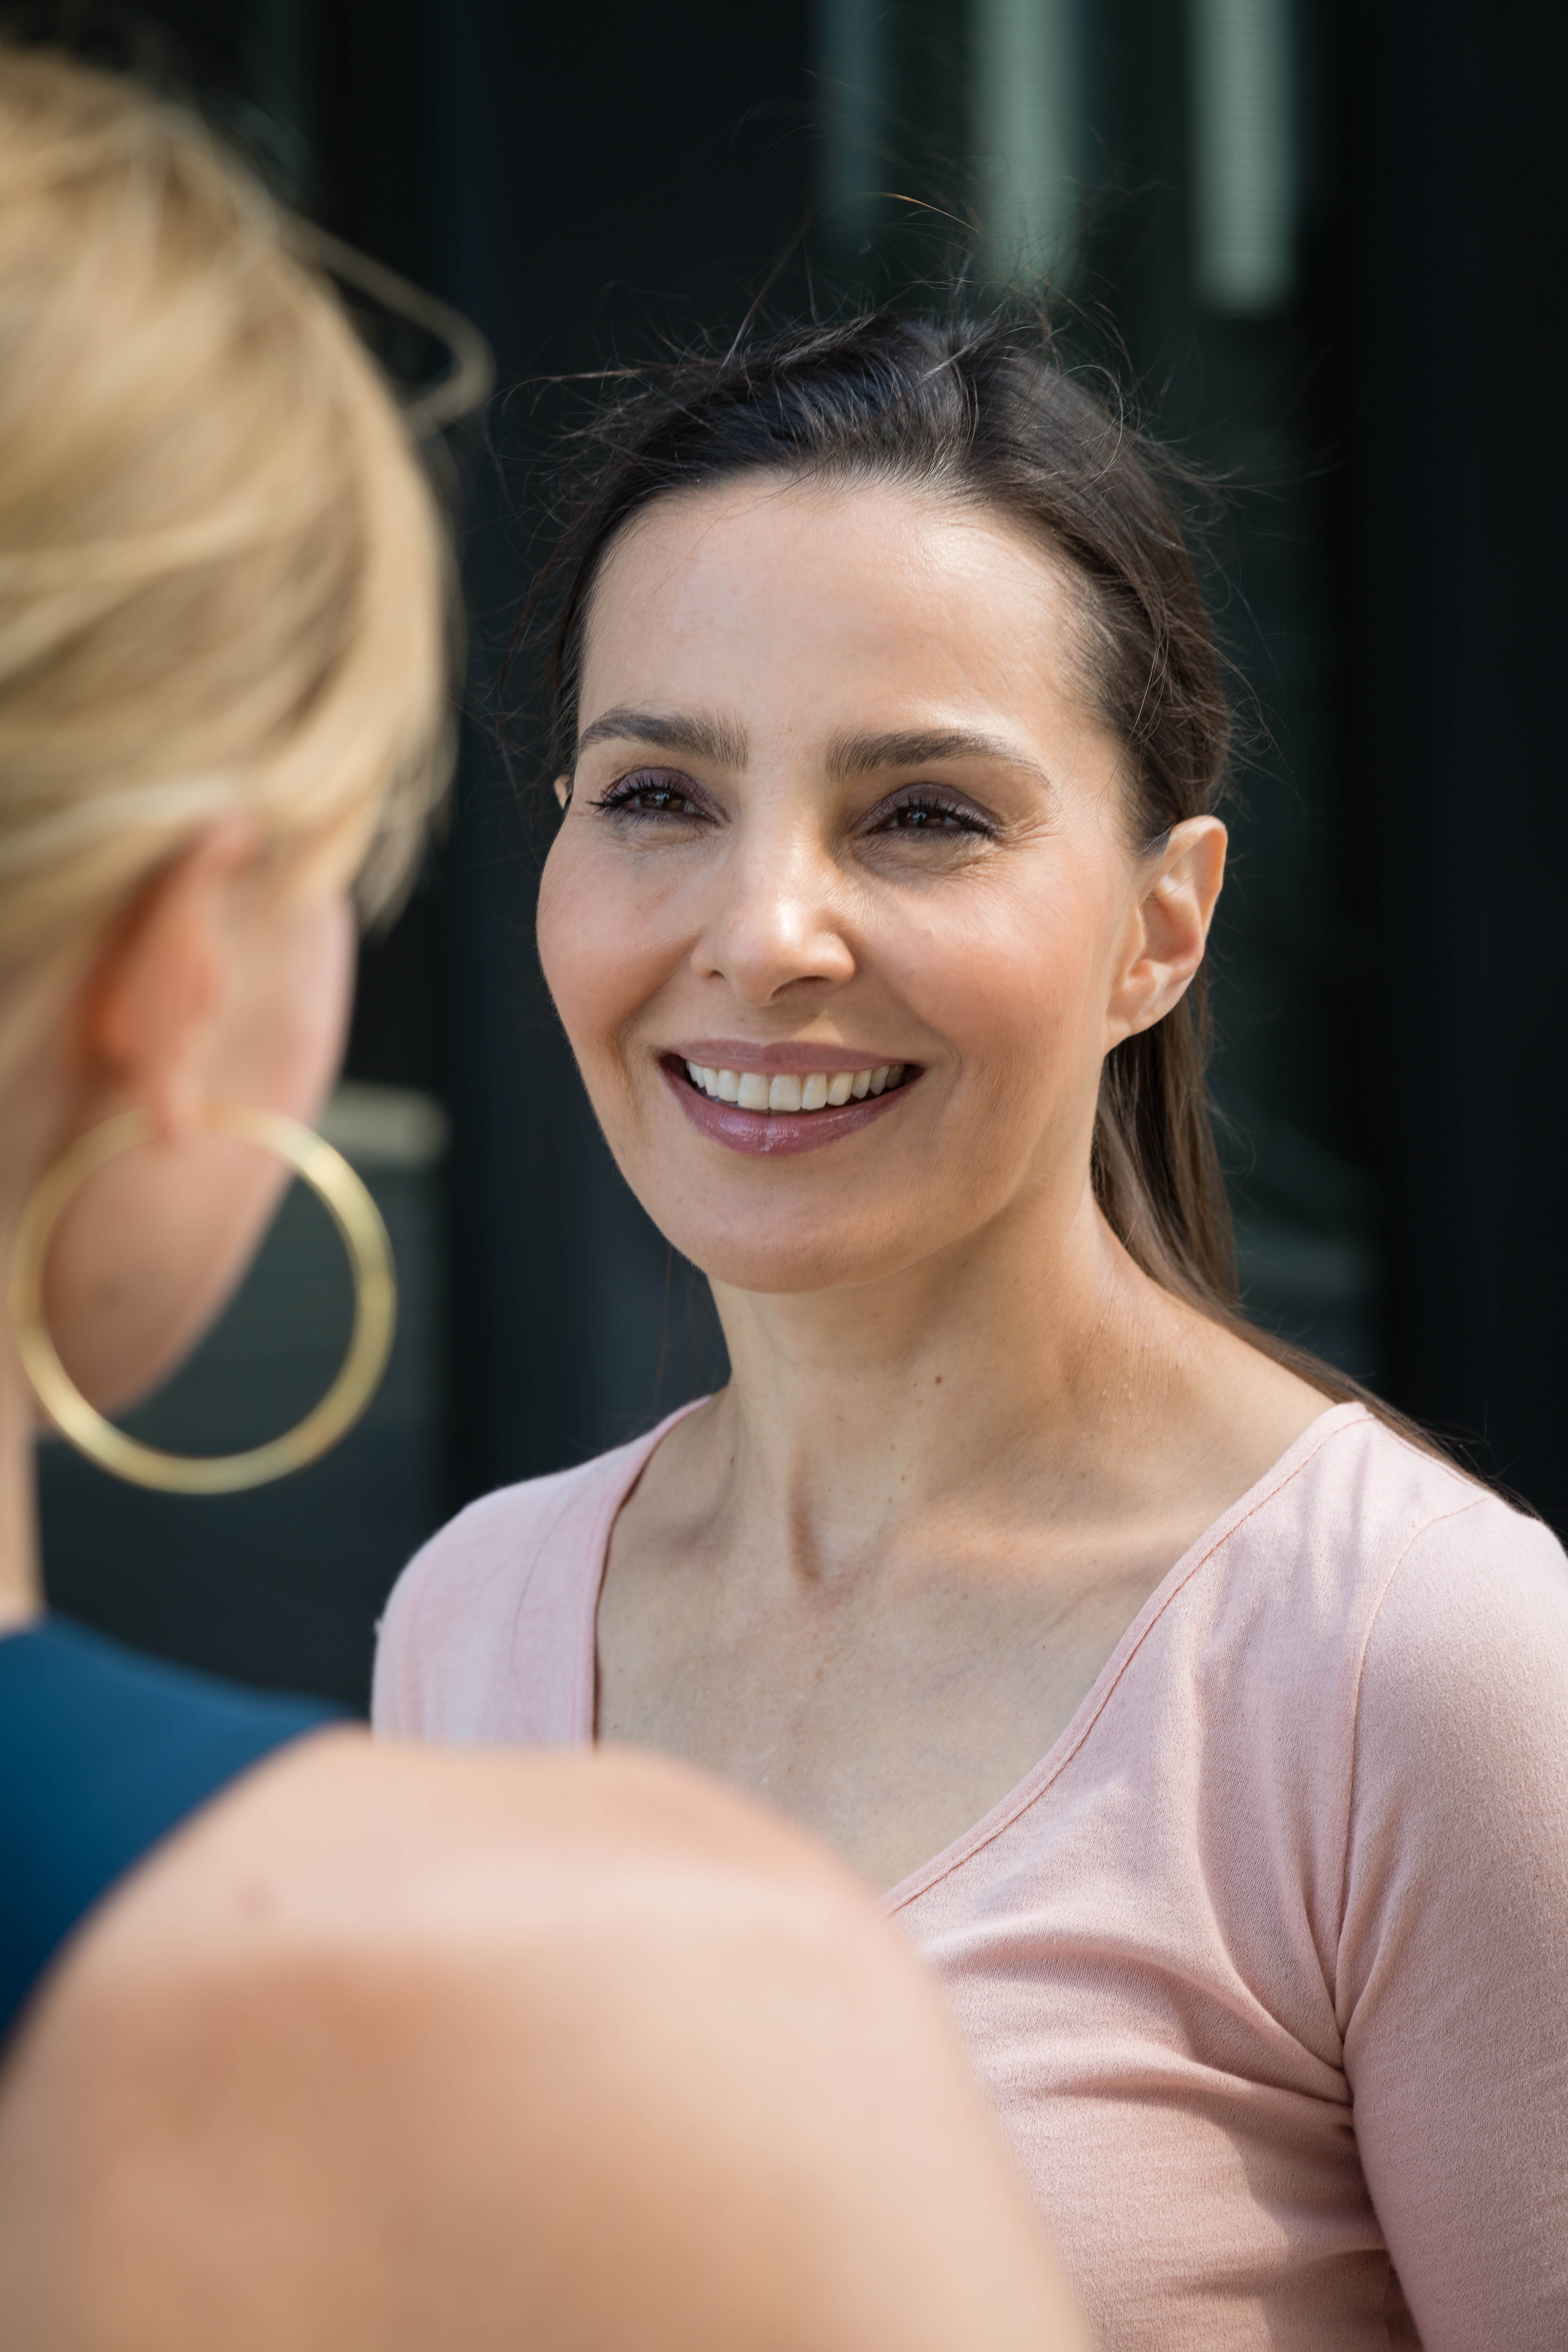 Dr. Annette Herold Aesthetics Redefinded Düsseldorf - Beautyblog Nowshine